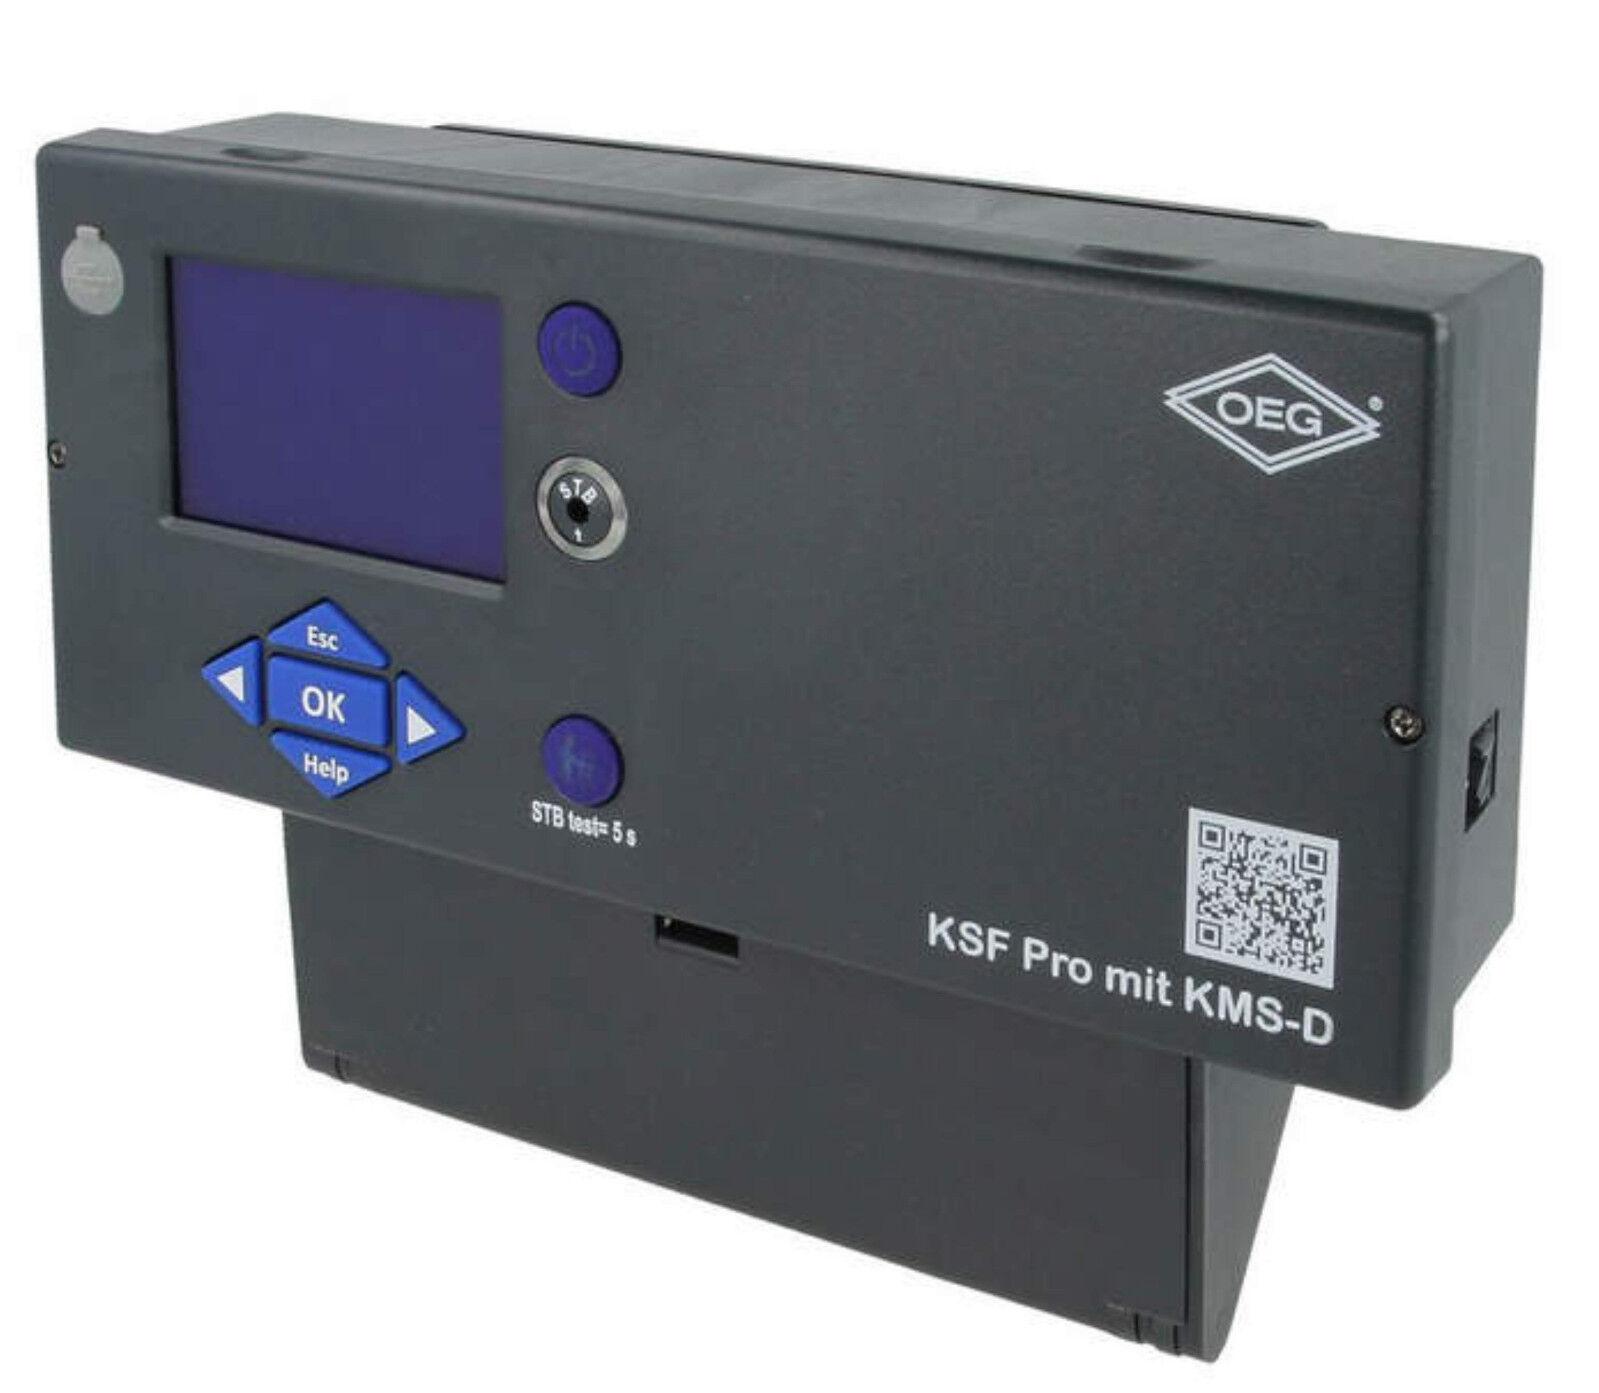 Kesselschaltfeld Regeler KSF-Pro mit KMS-D / KSF-Pro+ mit KMS-D+ KMS-D+ KMS-D+ 1 oder 2 Kreise 0cc535